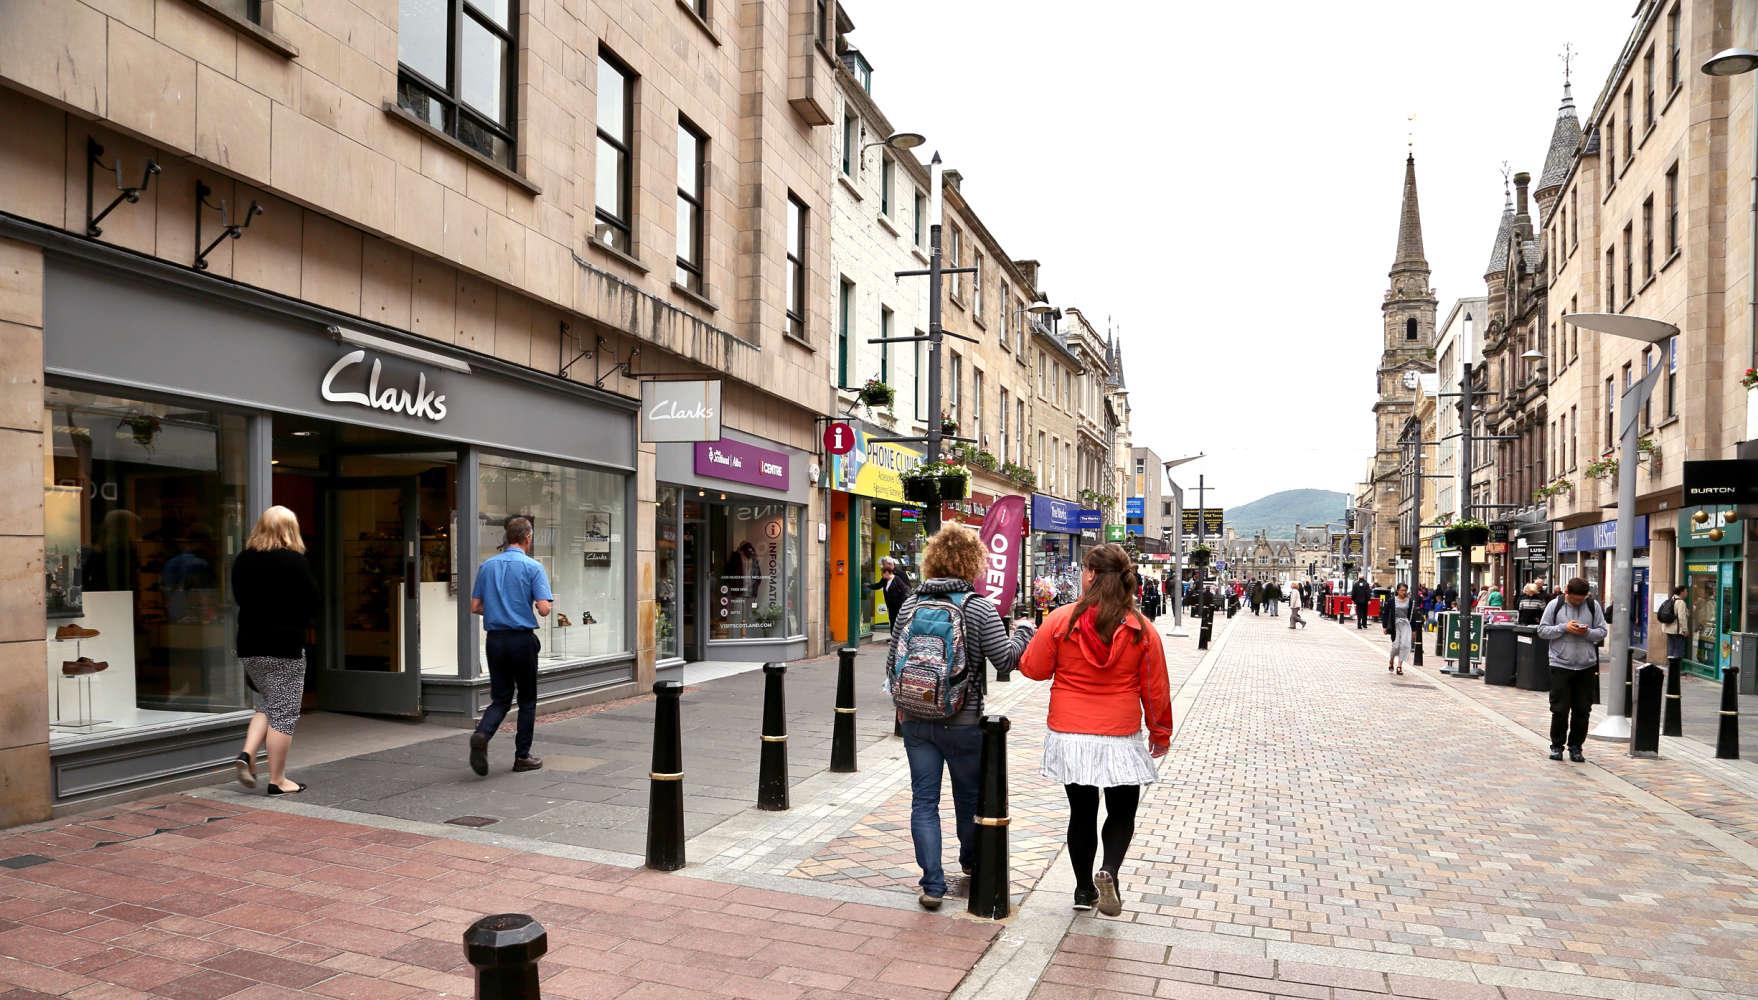 Retail high street Inverness, IV1 1JE - 40-42, High Street - 0029